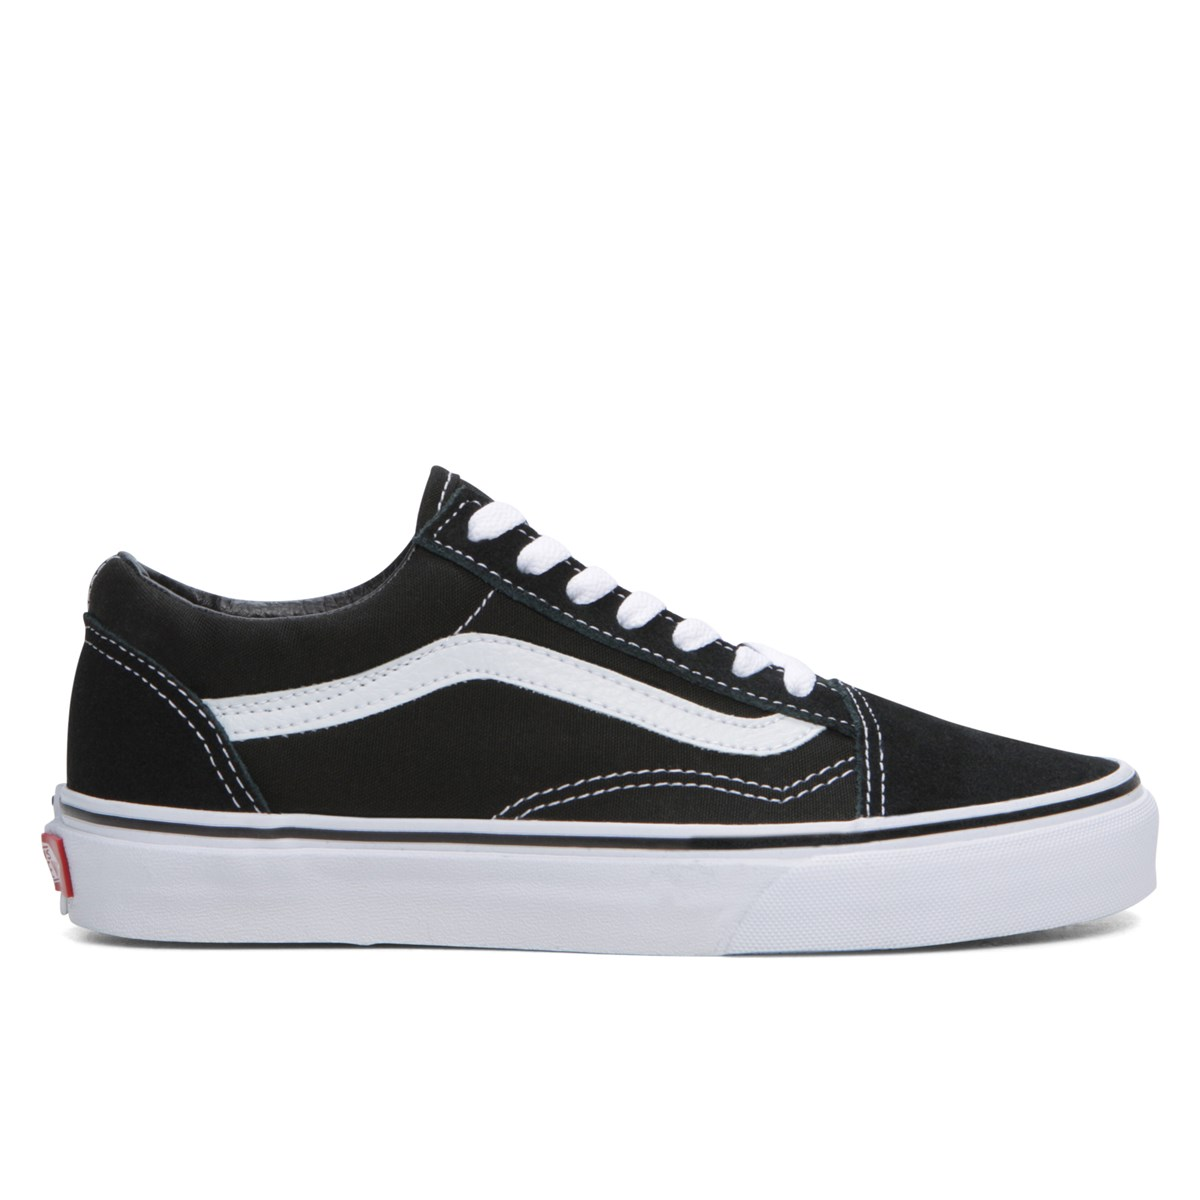 Vans Low Top Skate Shoes Womens